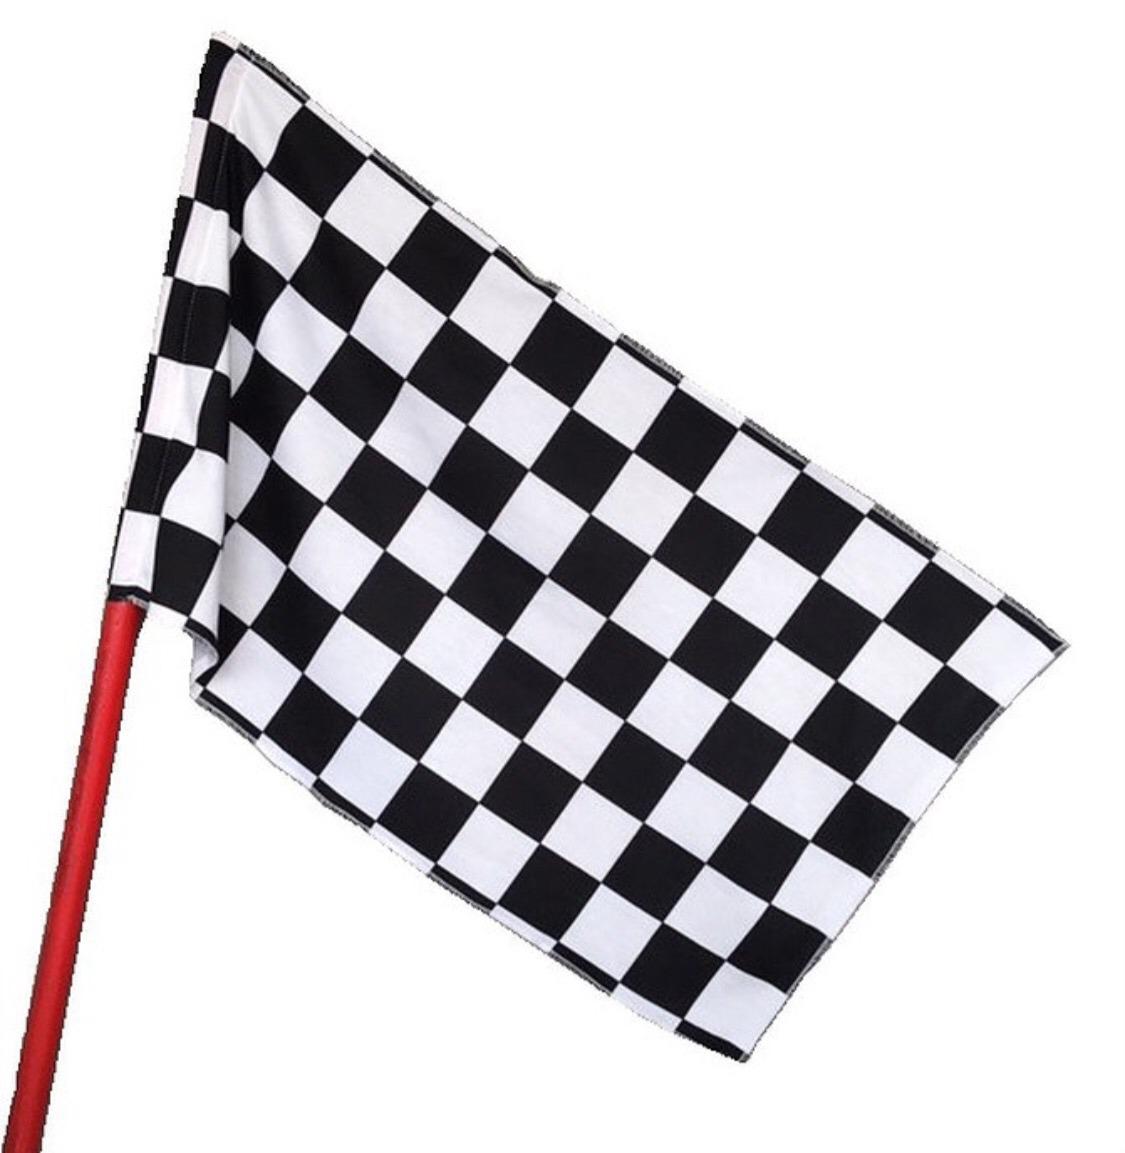 Banderas Para Carreras, F1, Nascar, Meta. 1.50 X 90